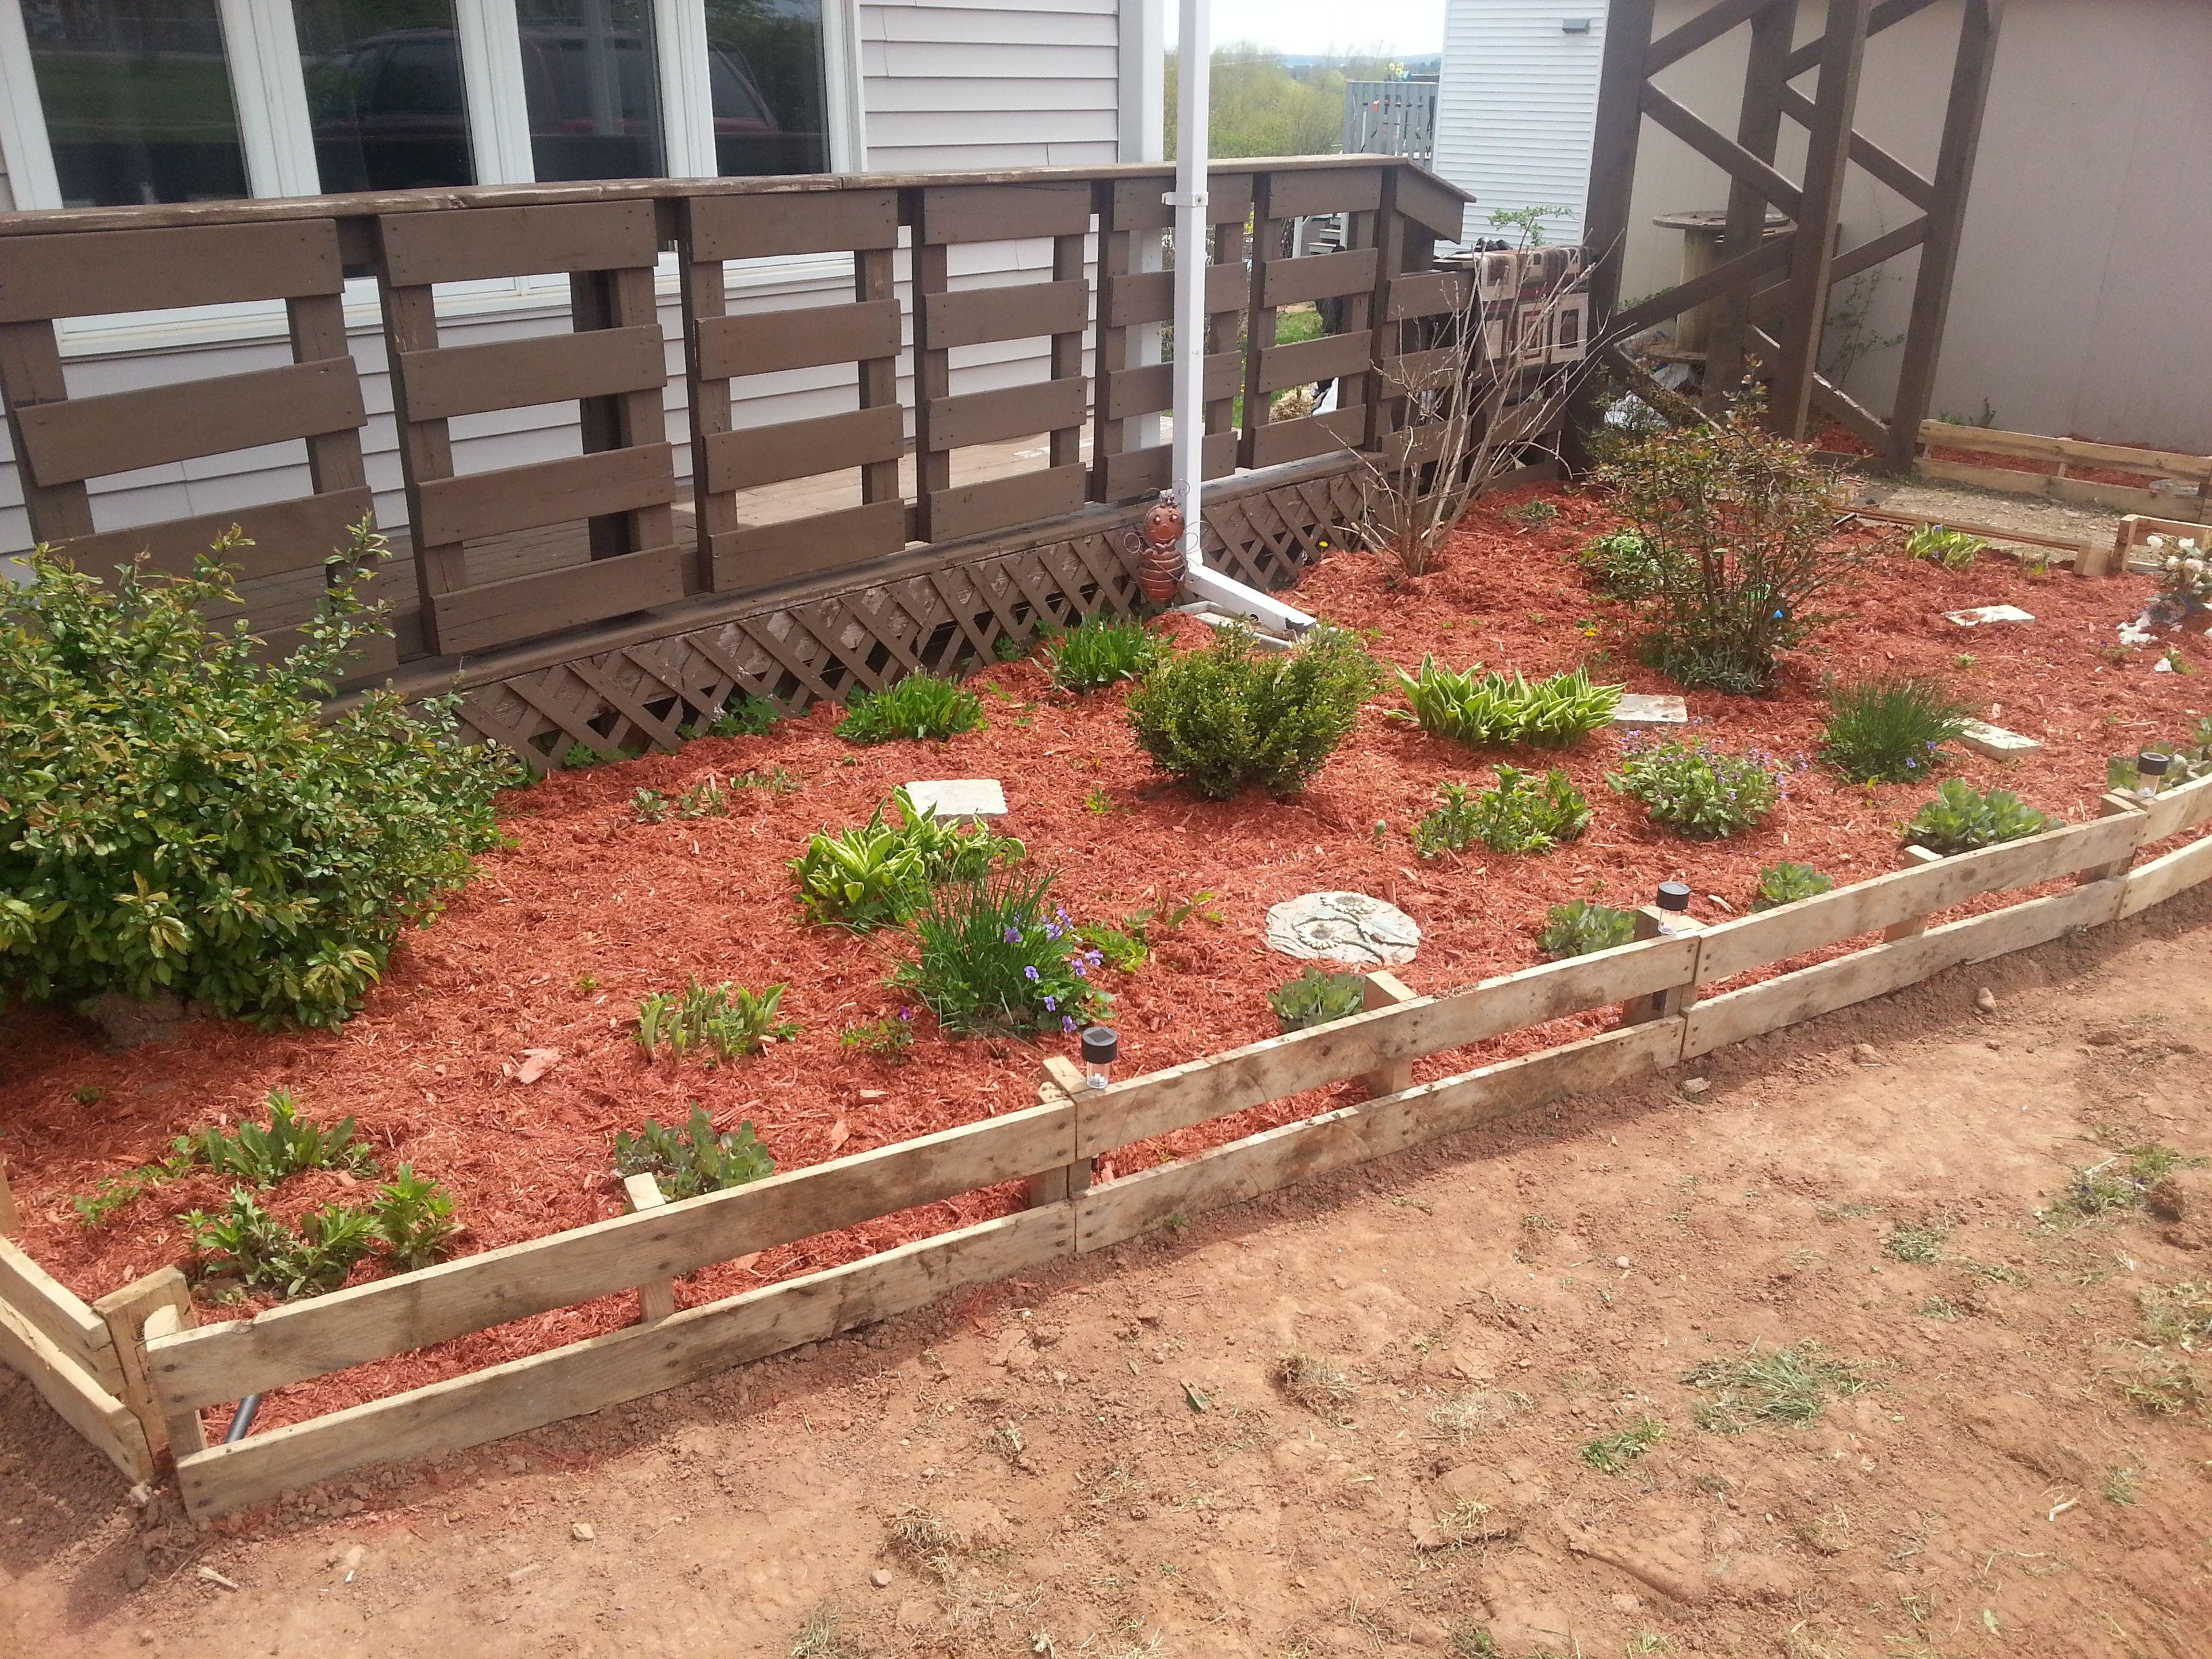 Pallet Garden Edge   Diy garden bed, Garden edging, Pallets garden